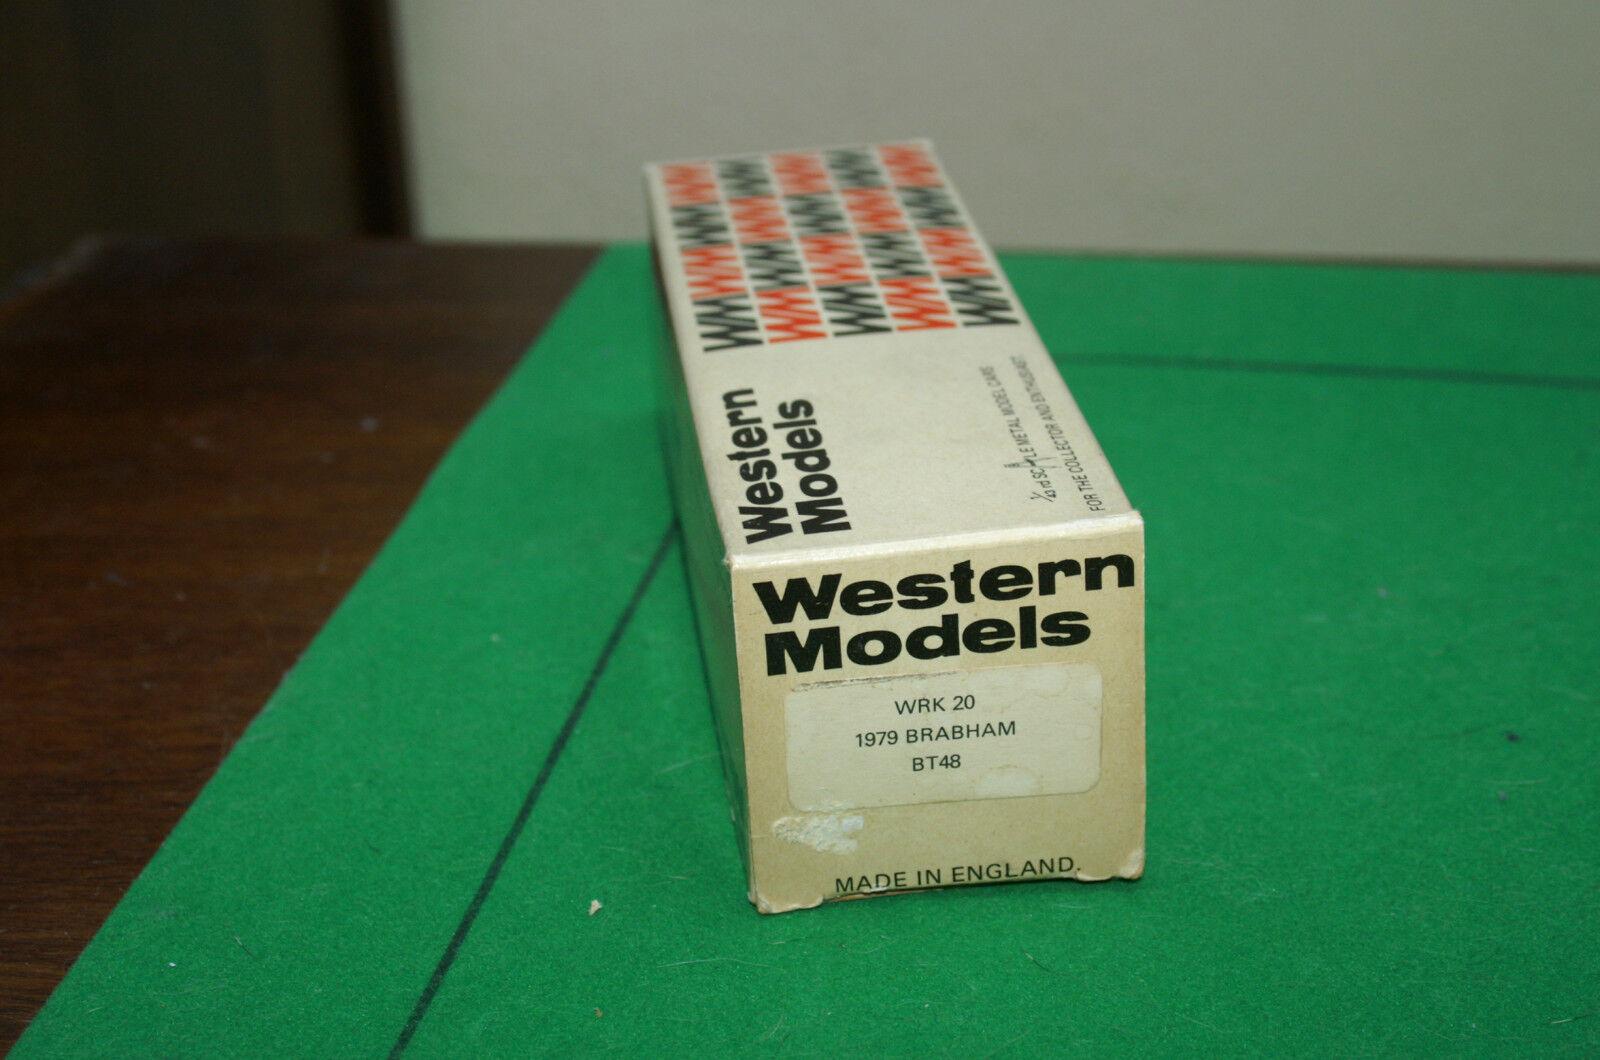 WESTERN MODELS 1/43 SCALE - WRK20 1979 BRABHAM BT48